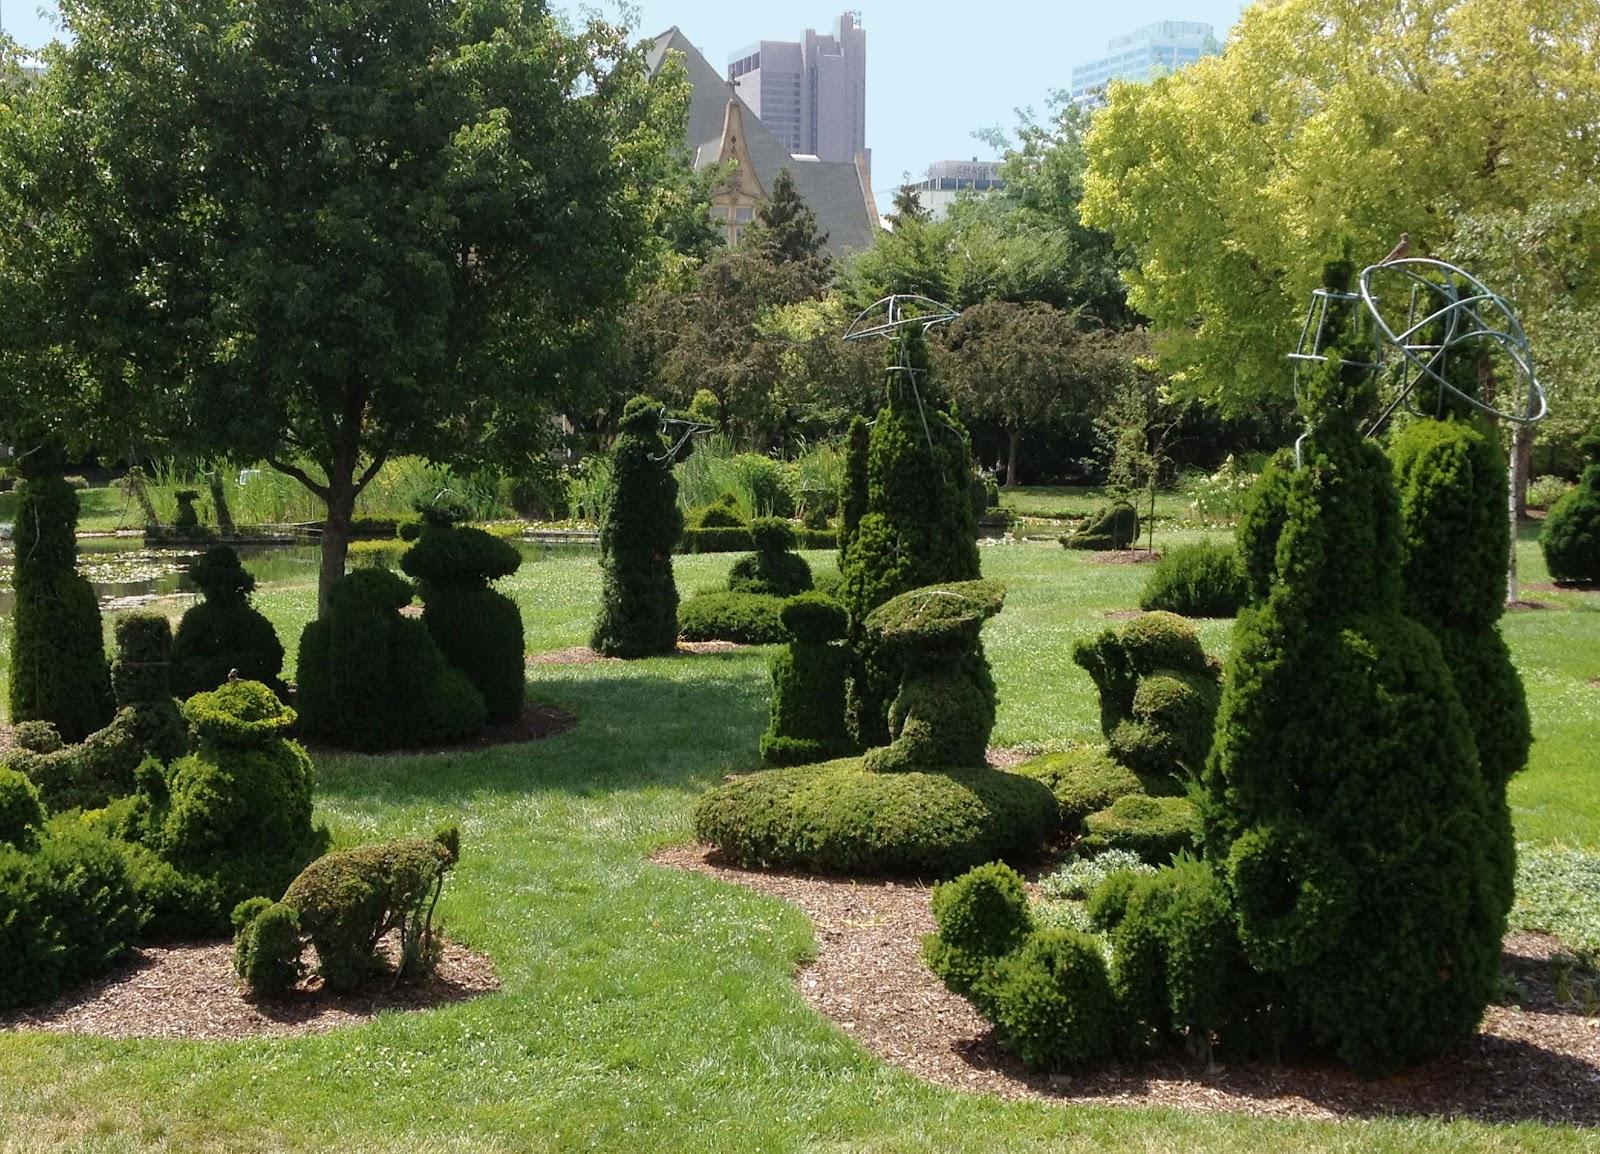 Entertaining Views From Cincinnati Topiary Park Taking